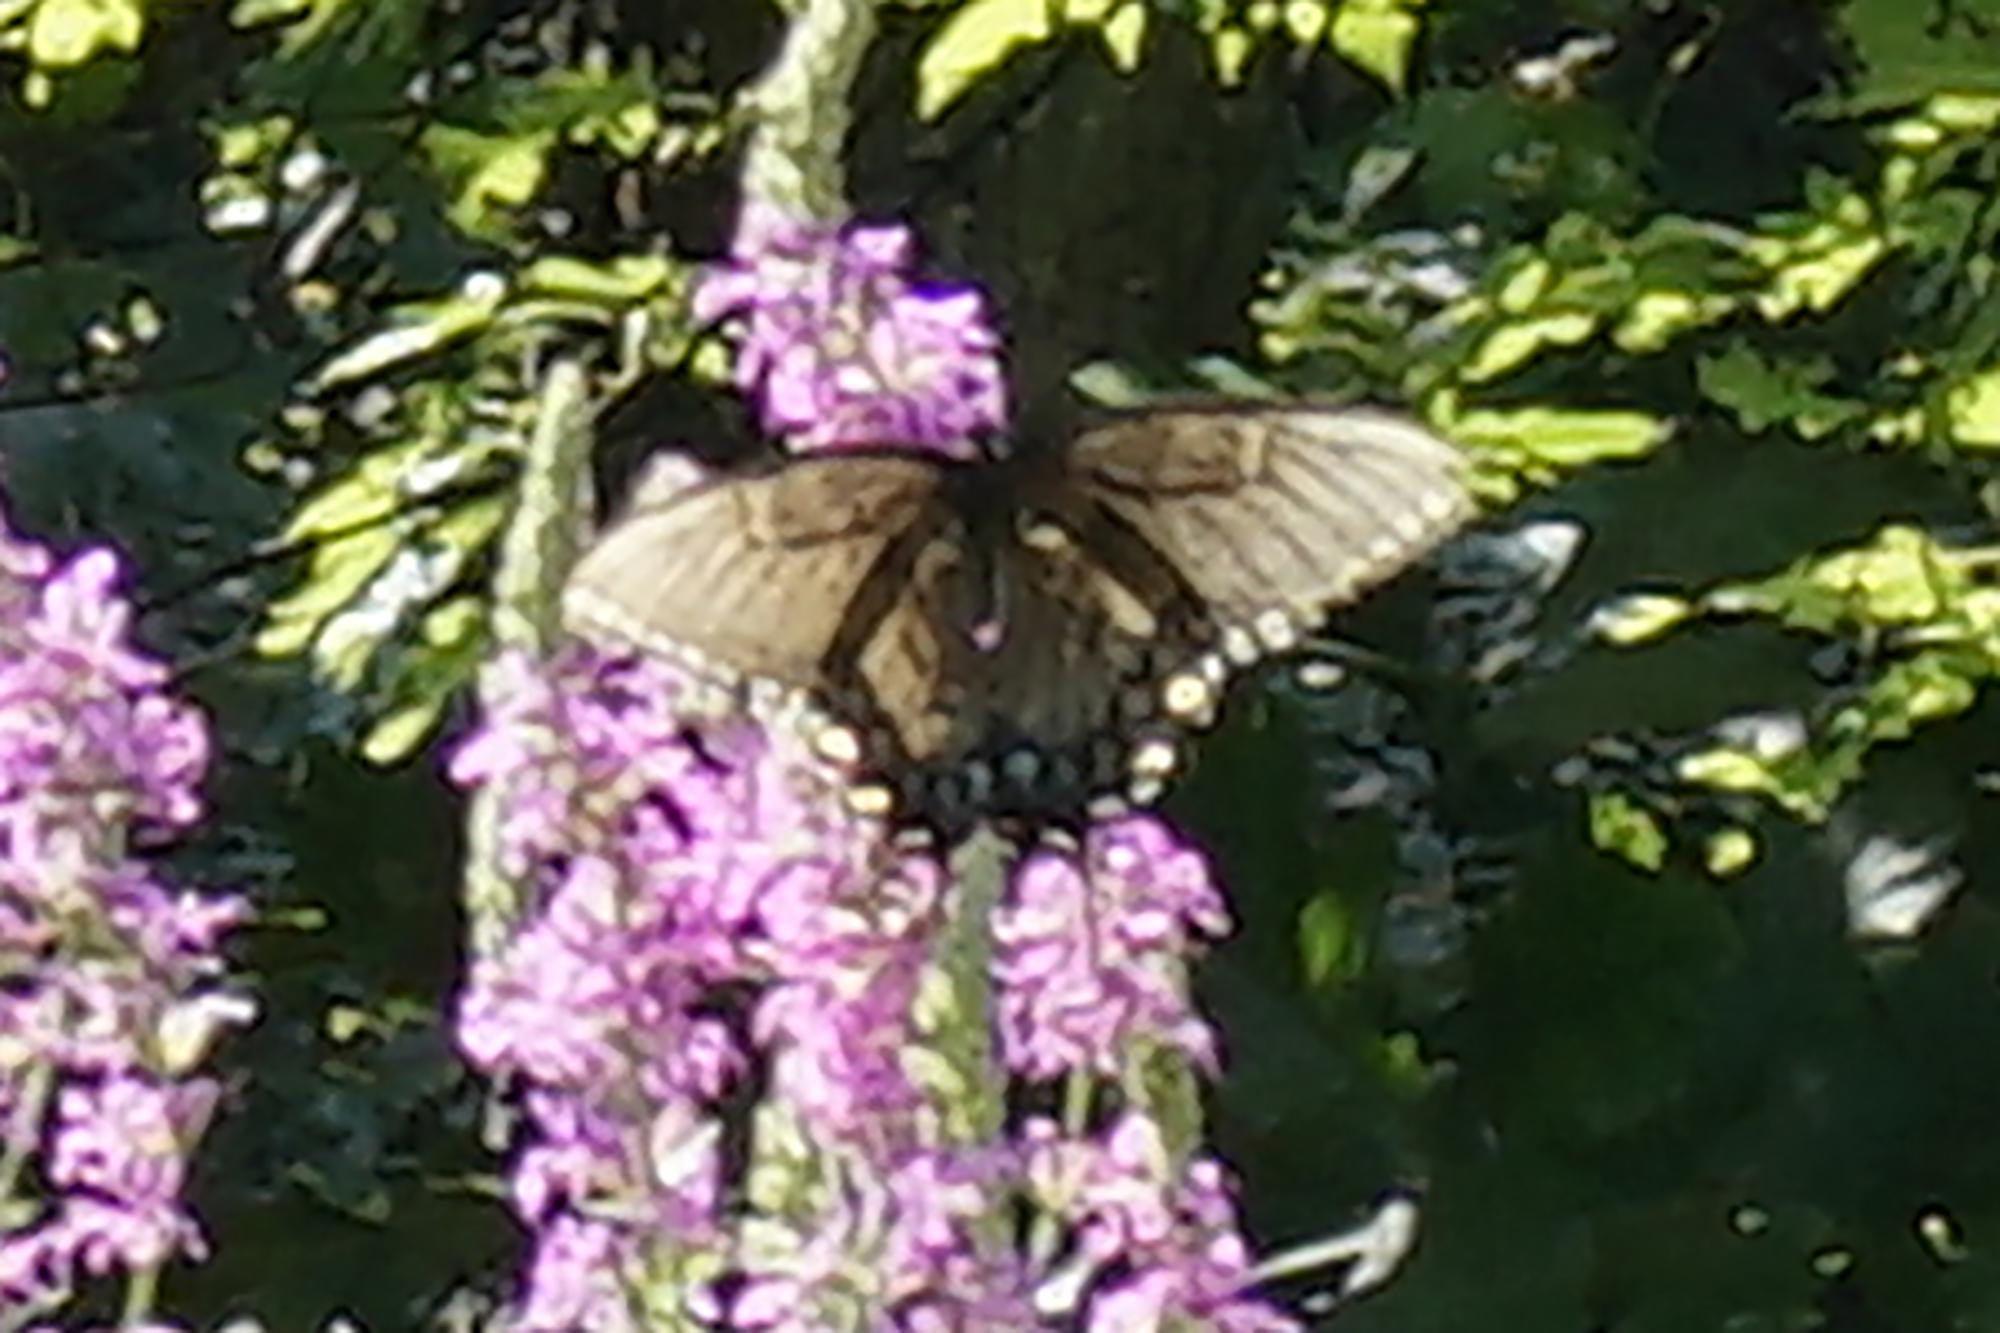 Eastern Black Swallowtail butterfly.  Photo by Jonathan Hodgson.